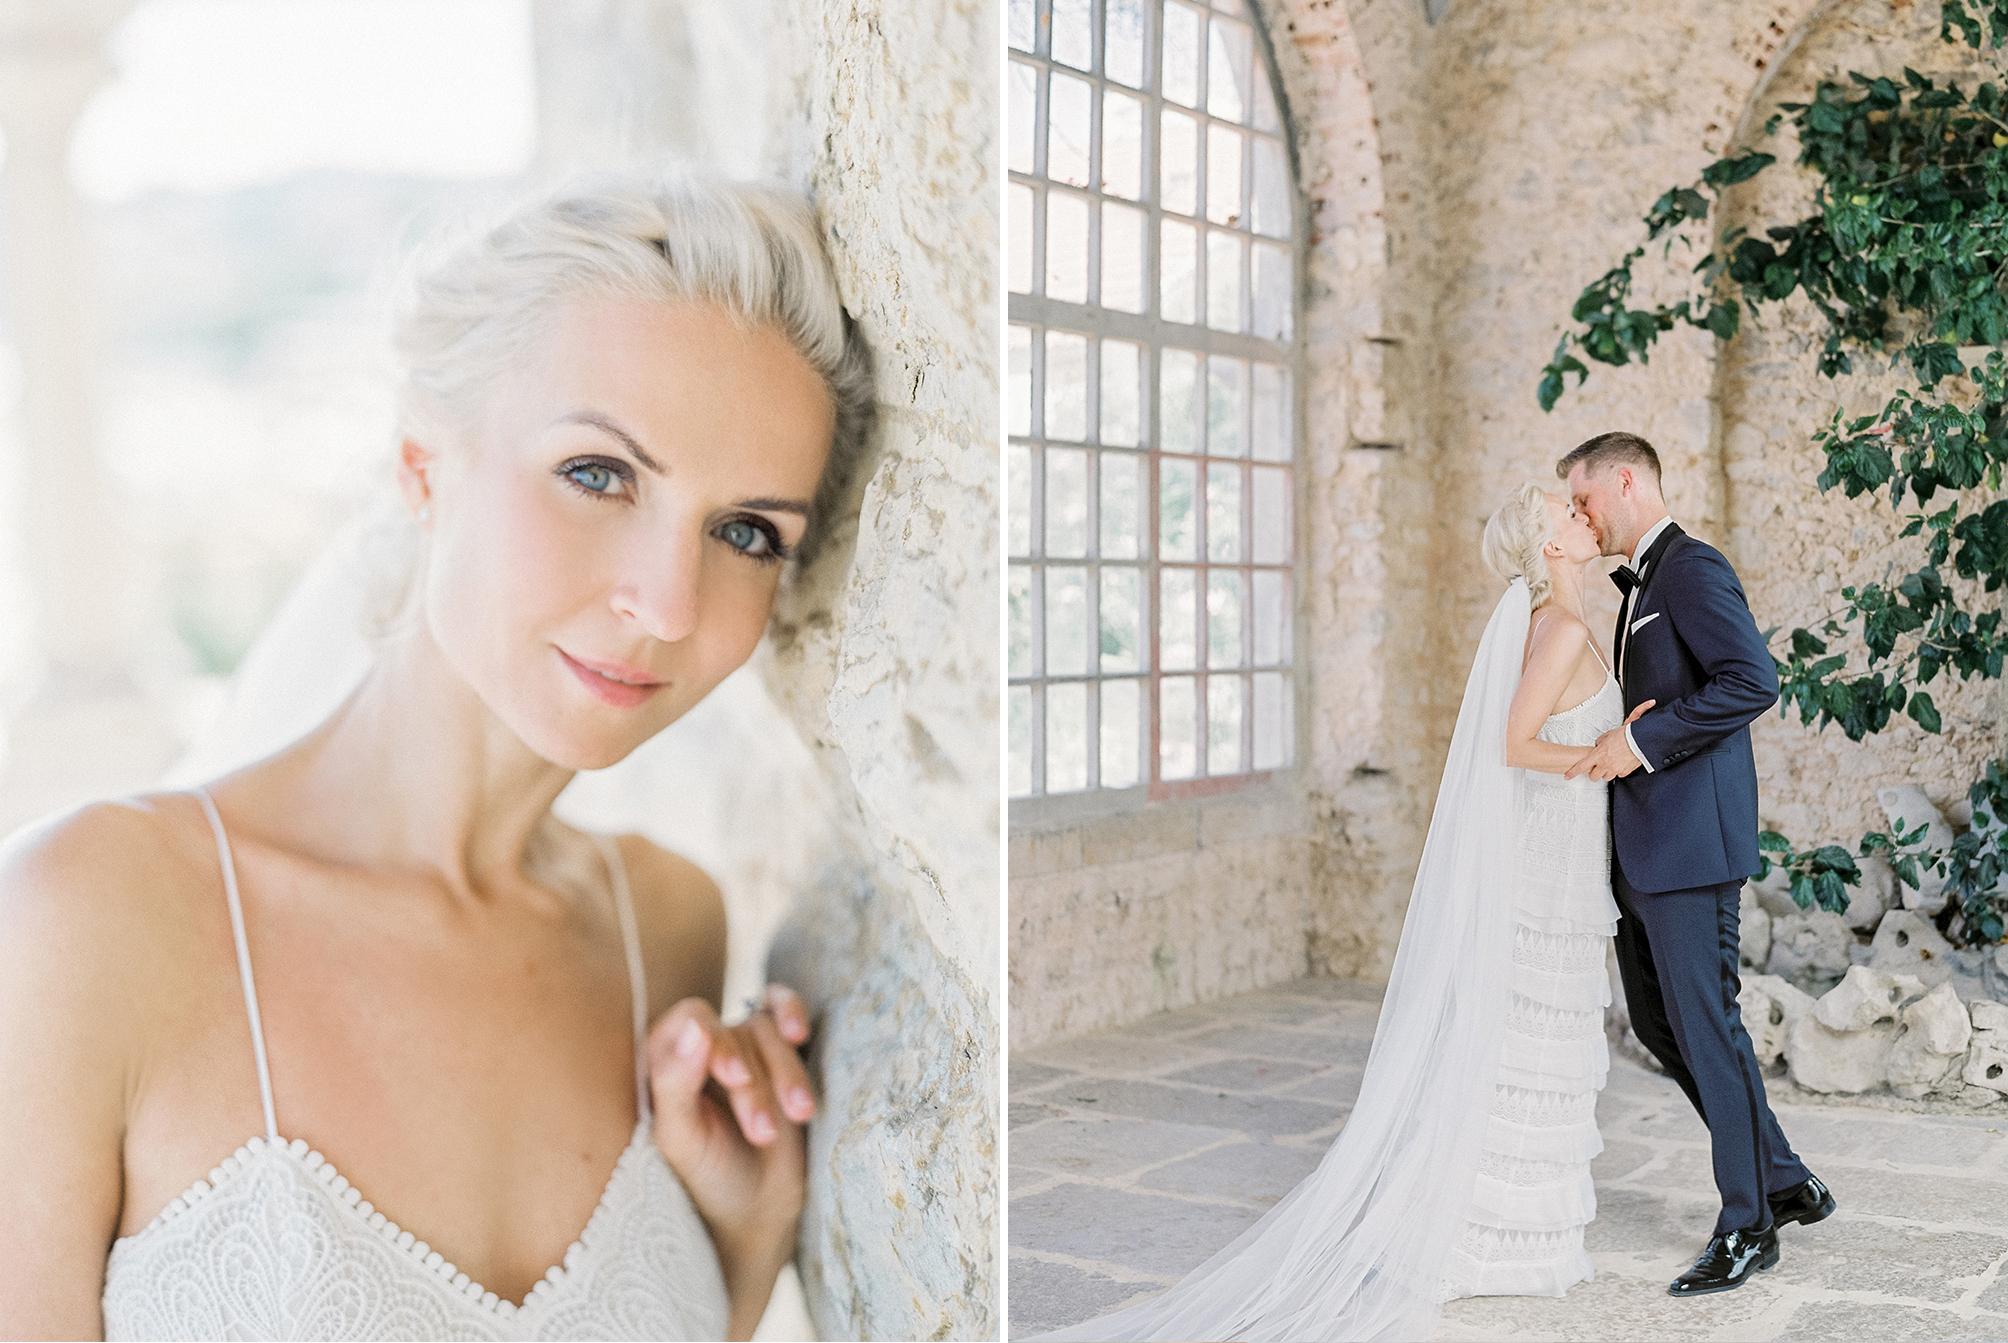 Nastia_Vesna_Photography_Wedding_Portugal_21.jpg